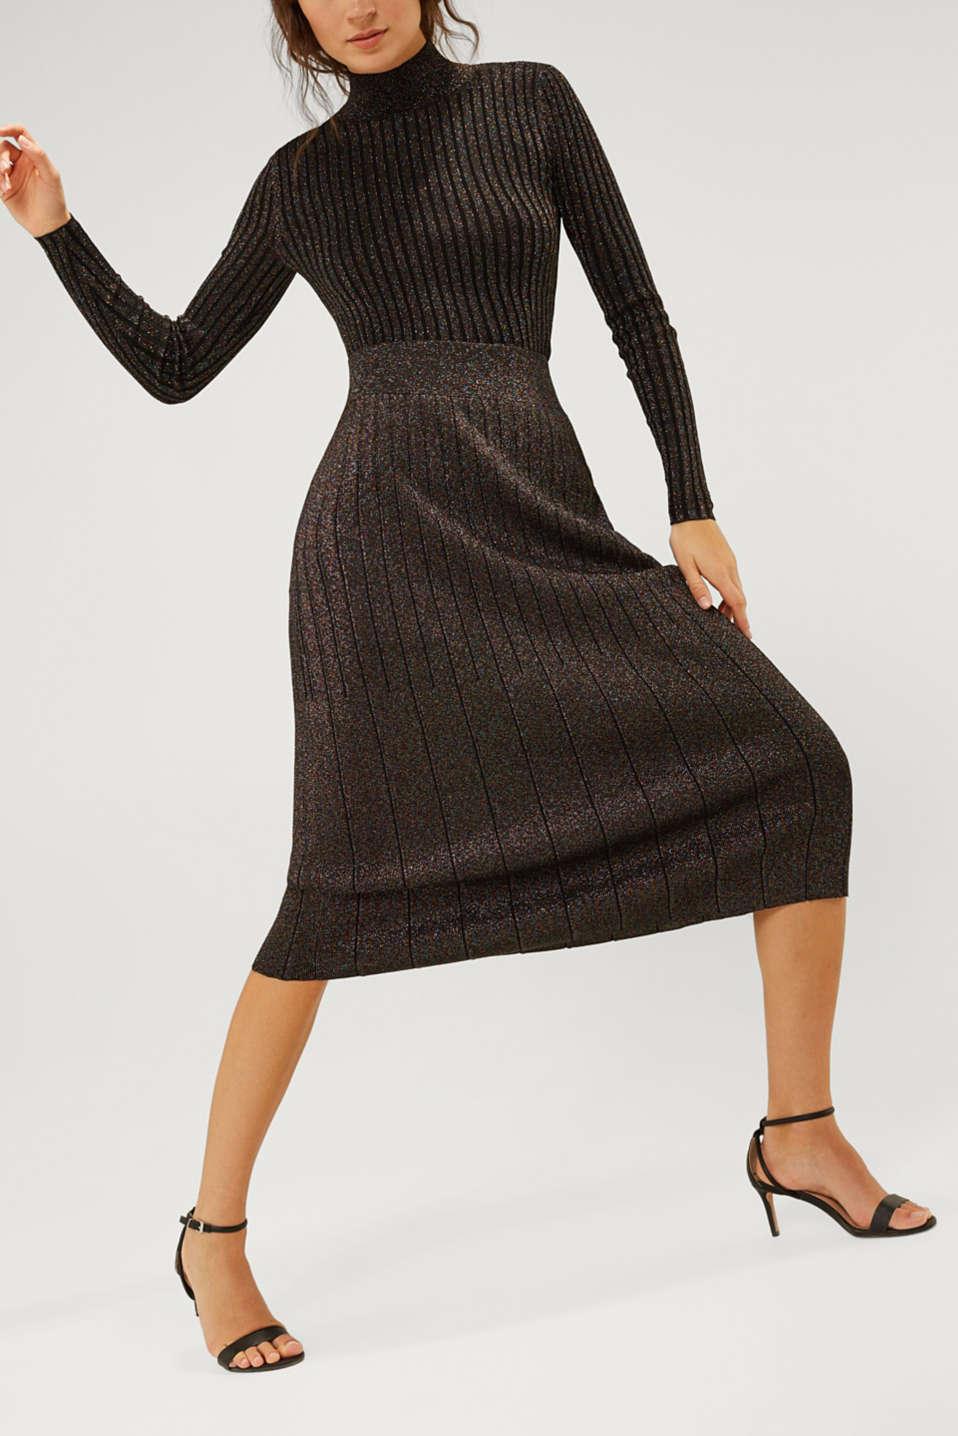 Colourful glittering knit skirt